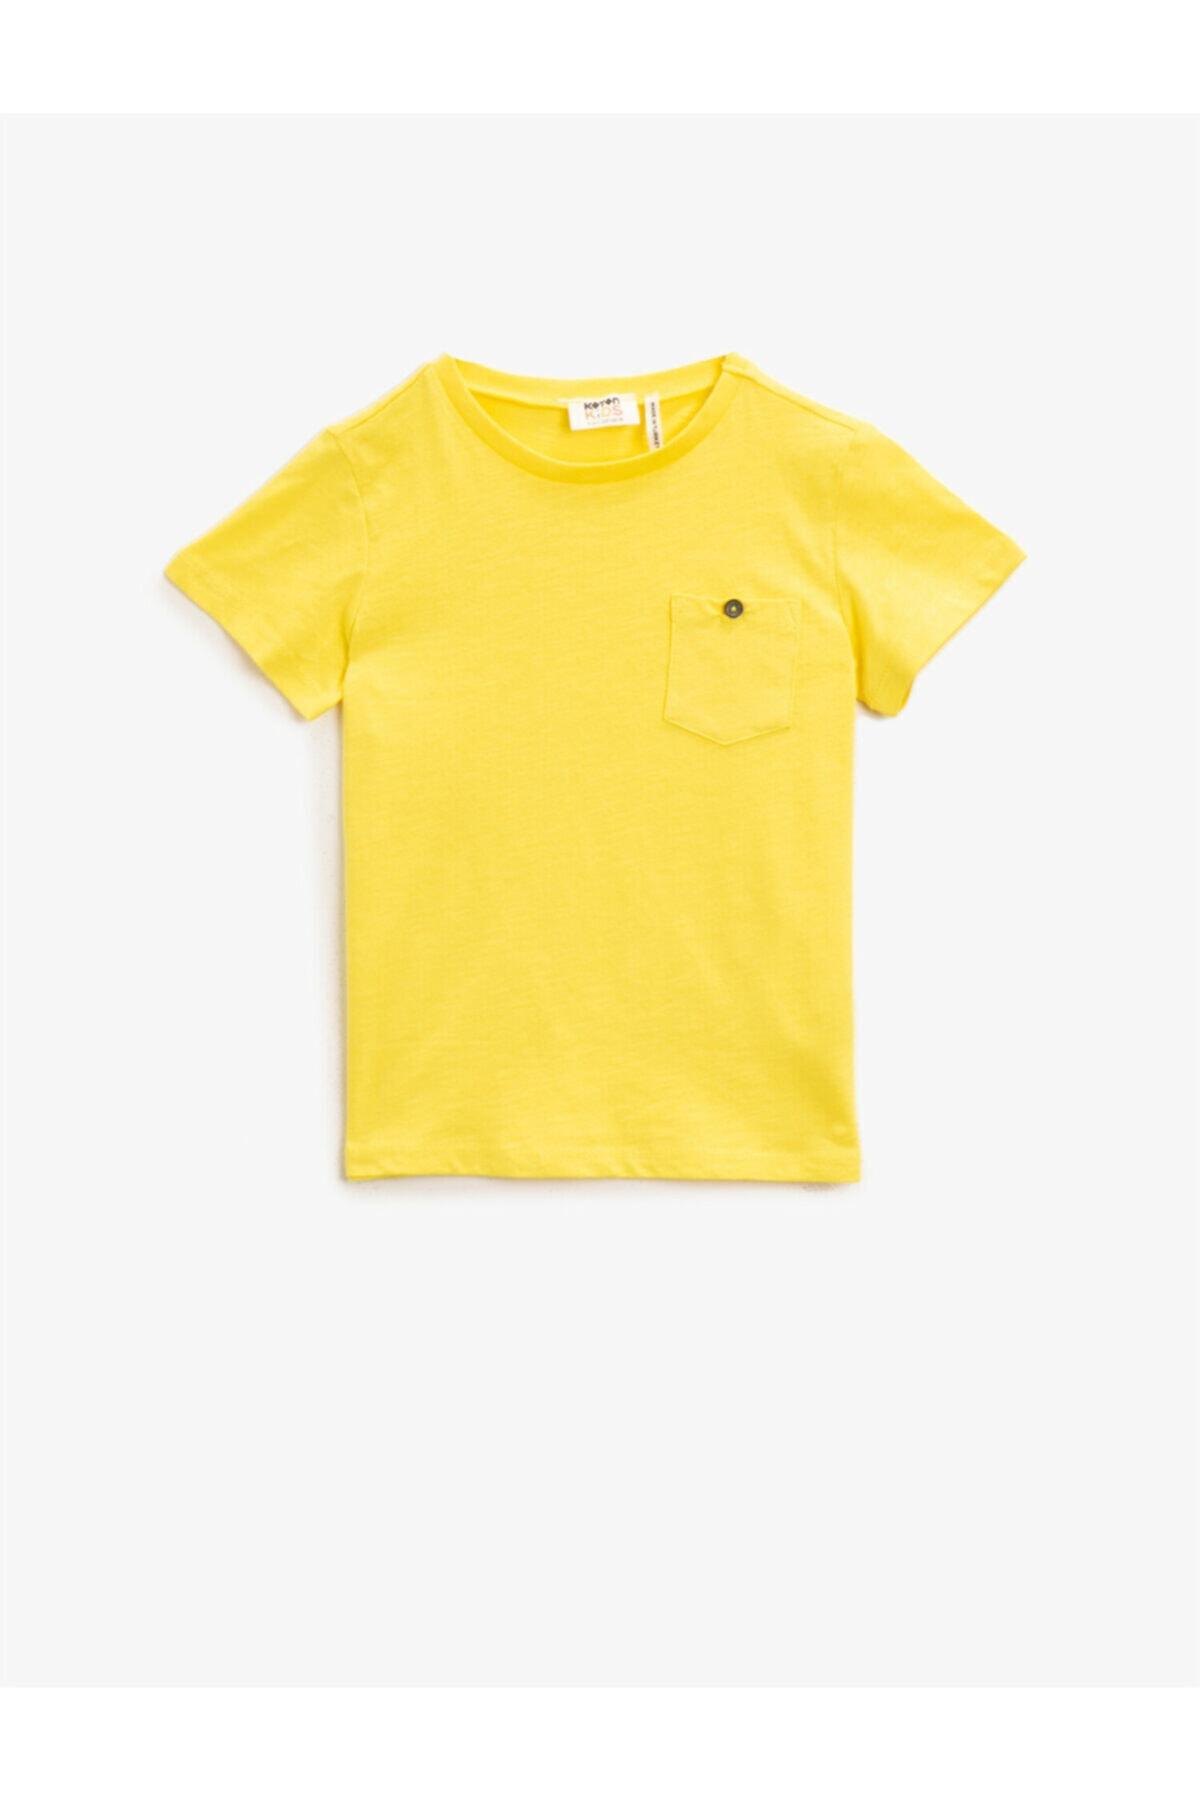 مدل تیشرت 2021 برند Koton Kids رنگ زرد ty98134918